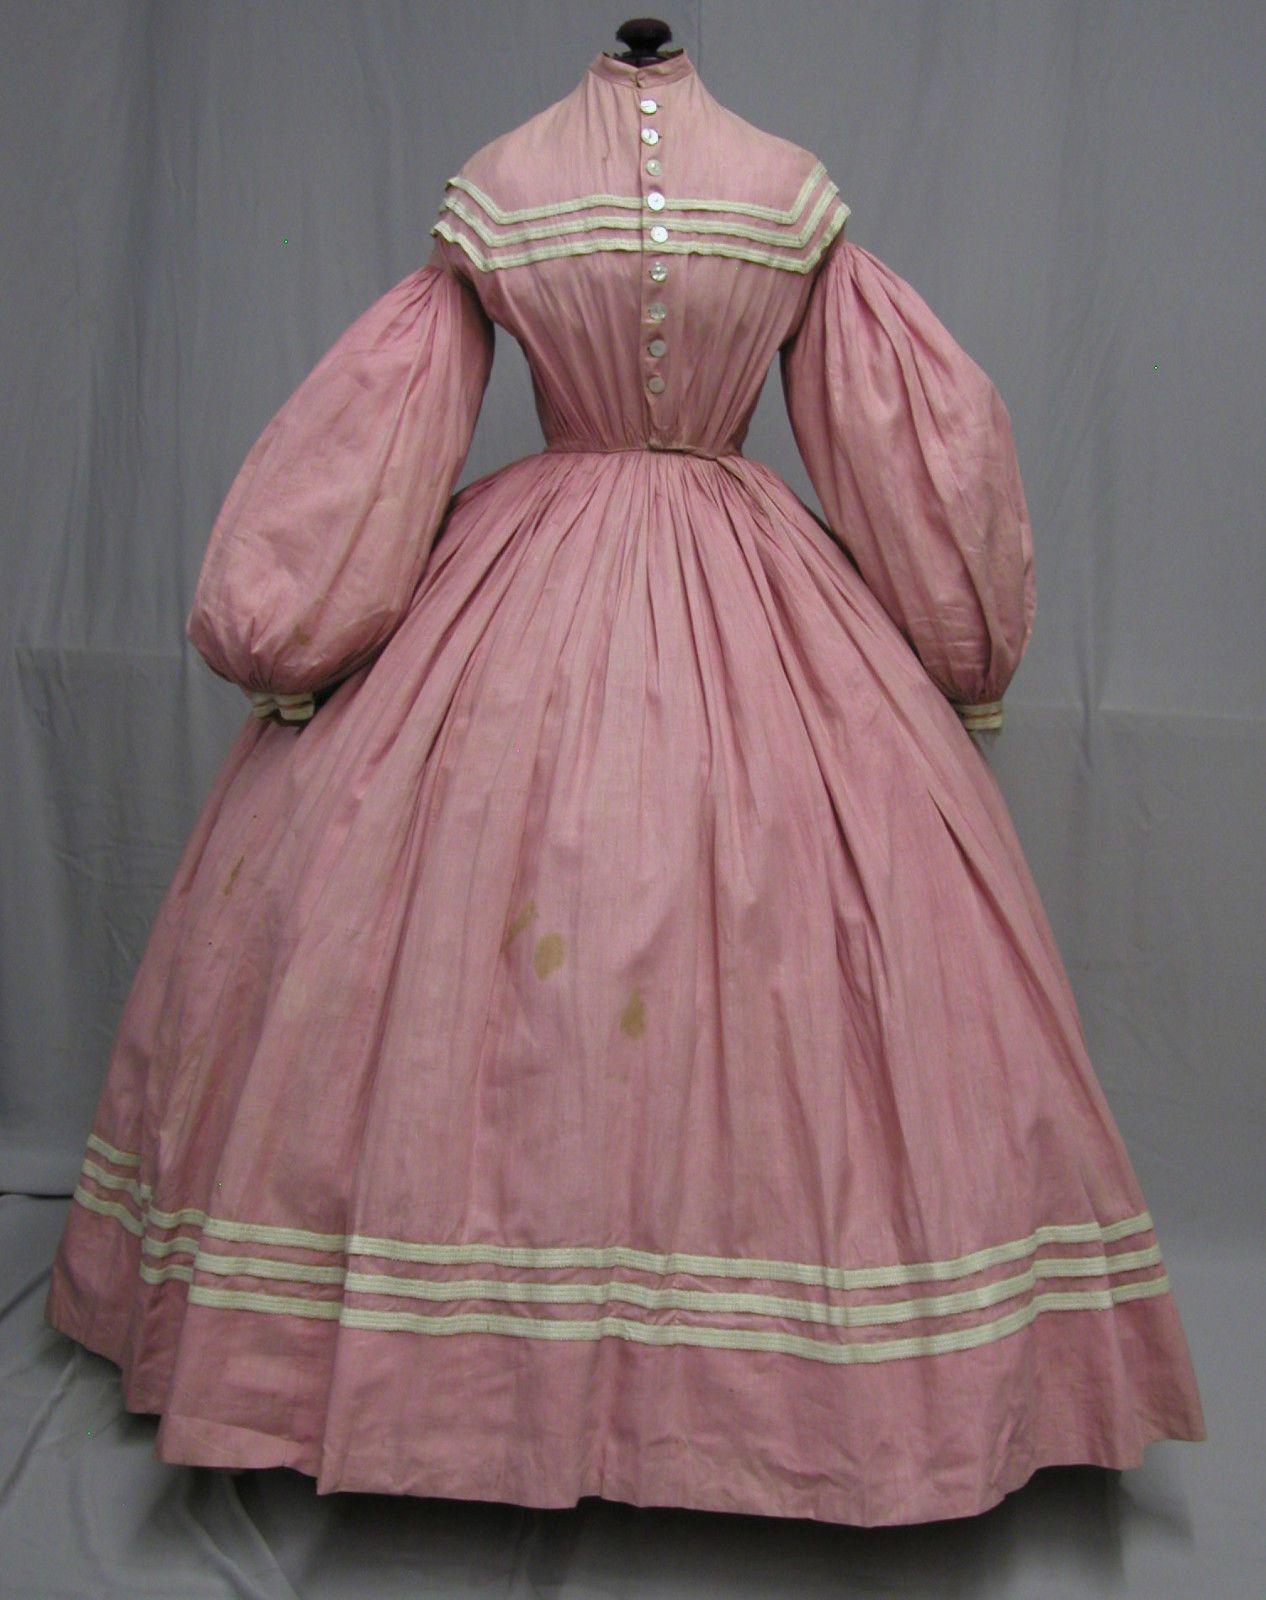 1148 Spectacular 1860 S Civil War Era Pink Cotton Daytime Ensemble Civil War Dress Civil War Fashion Victorian Fashion [ 1600 x 1266 Pixel ]